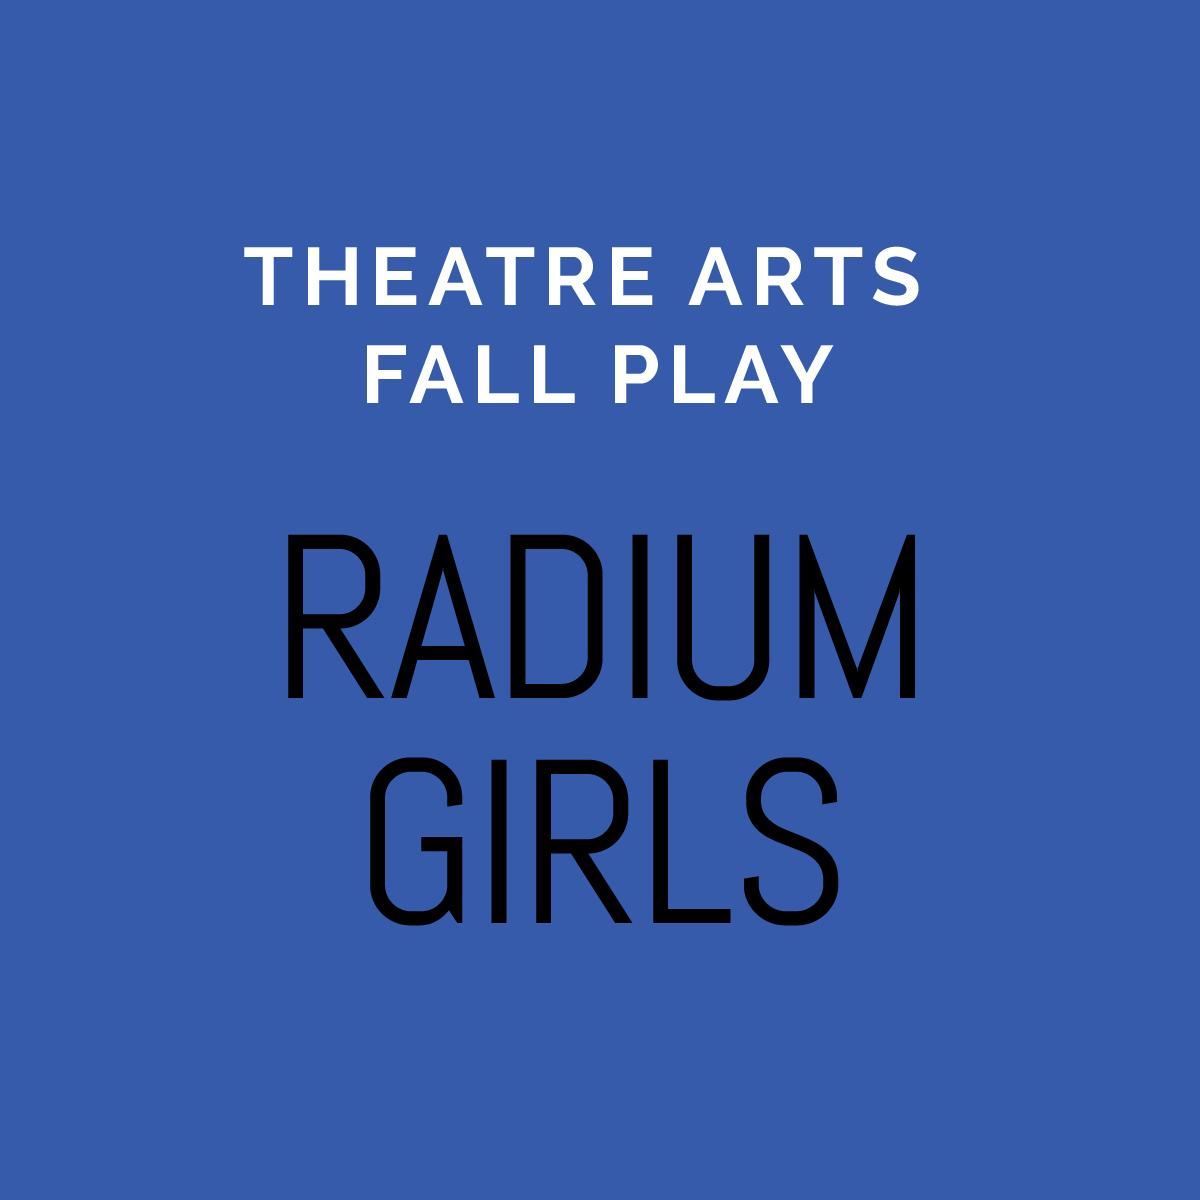 Theatre Arts Fall Play - Radium Girls